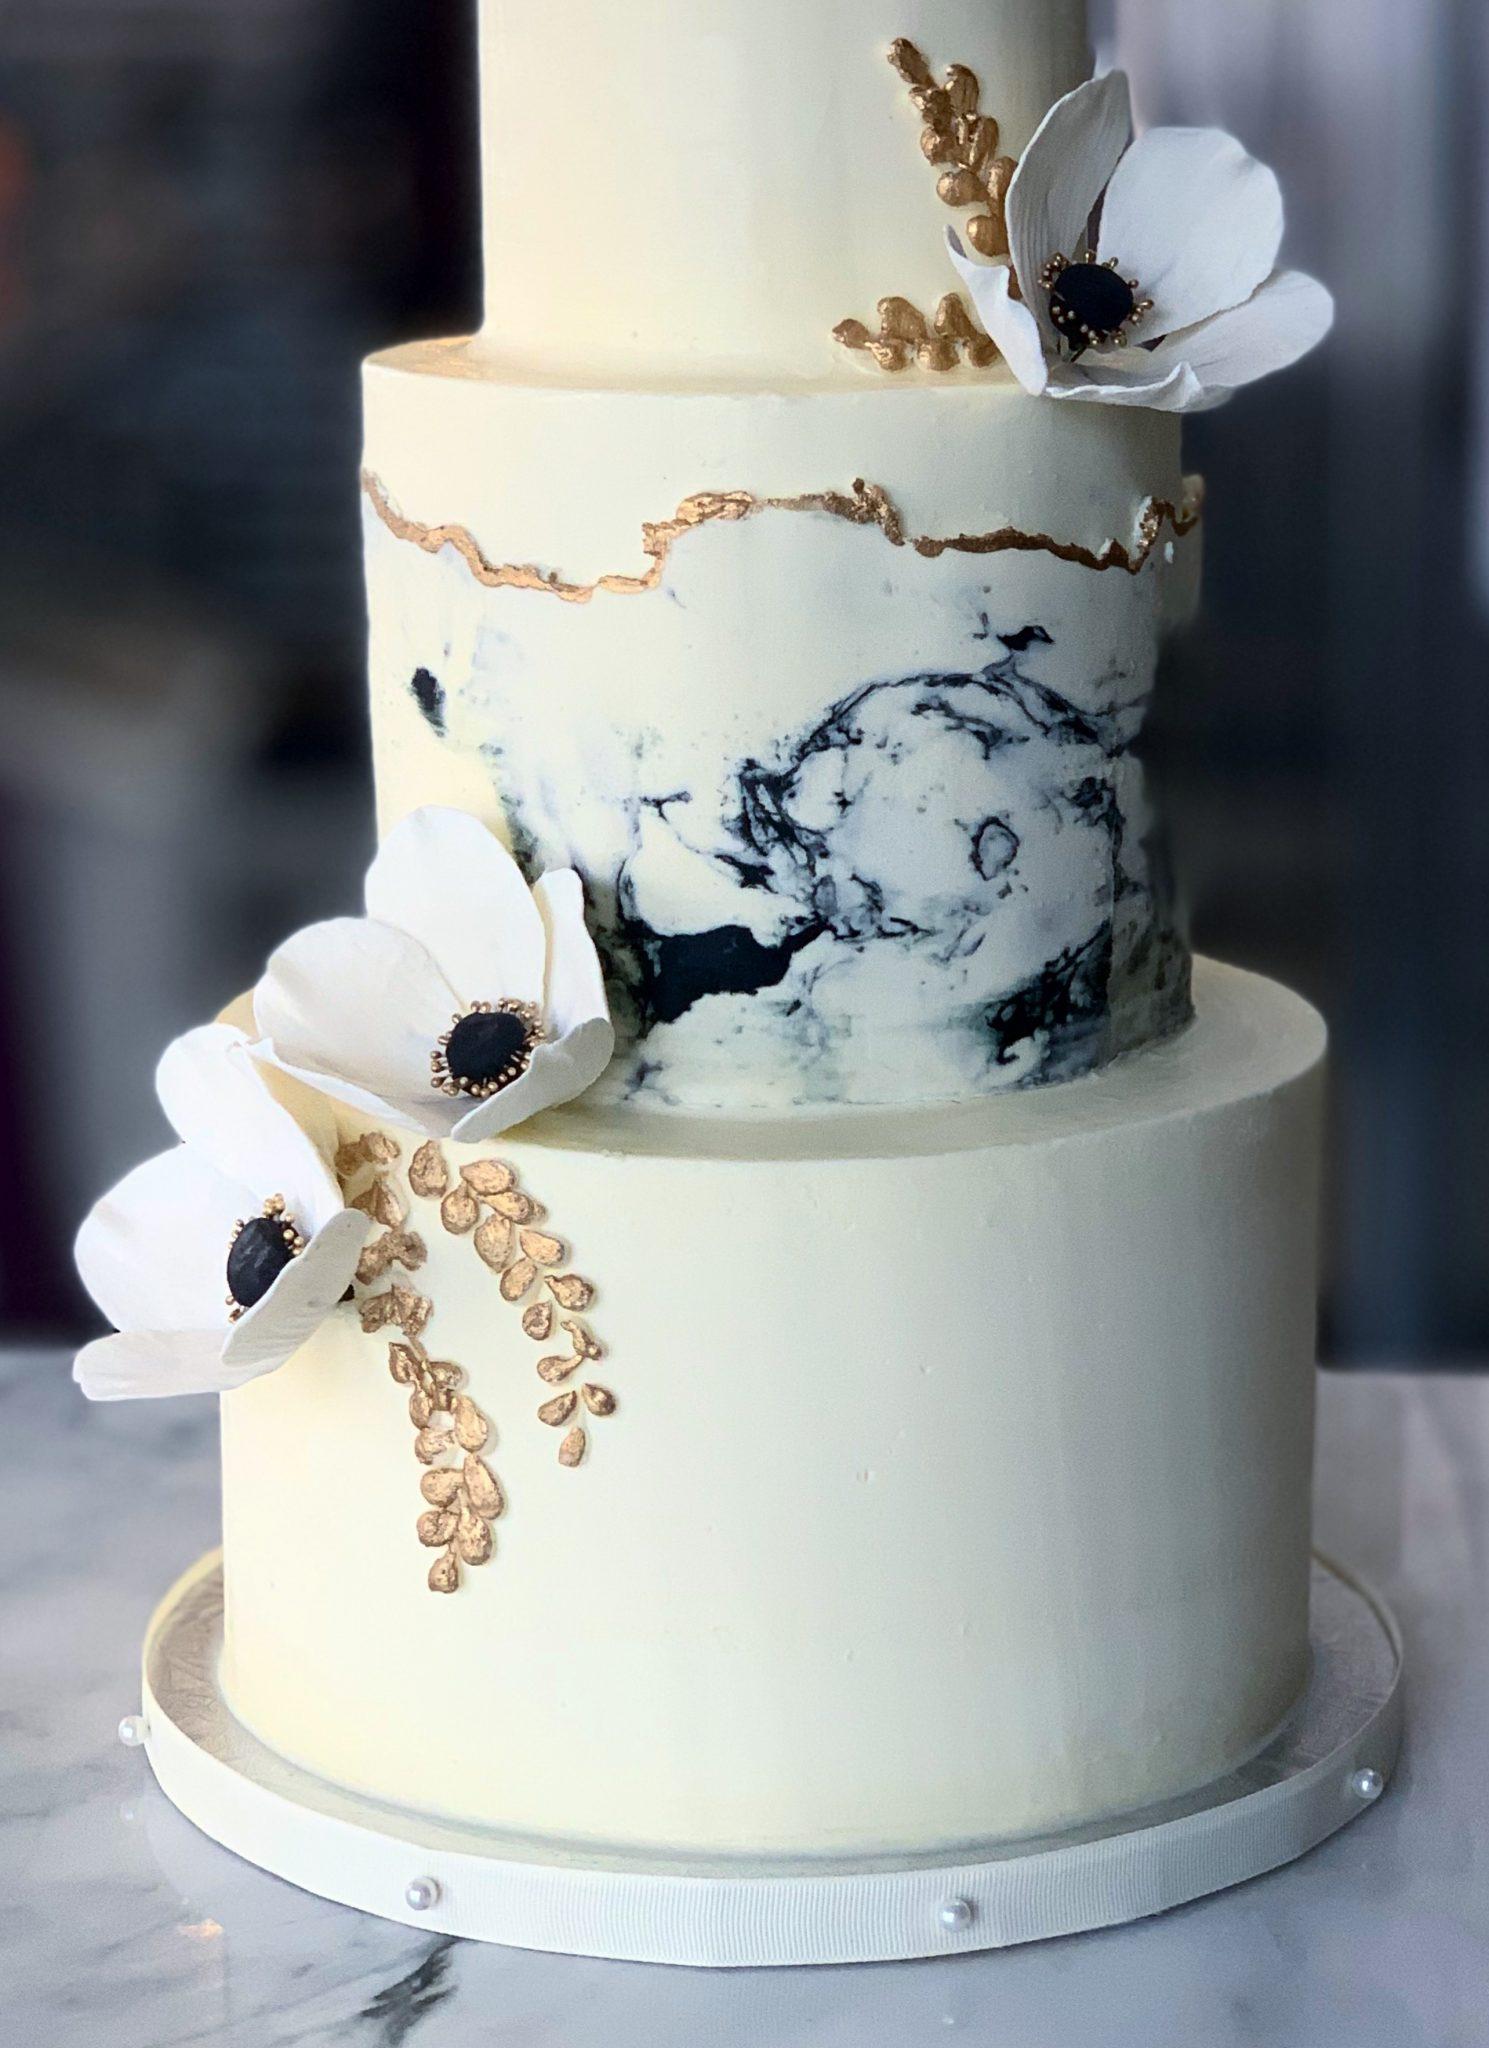 marble-anemone-cake-whipped-bakeshop-2